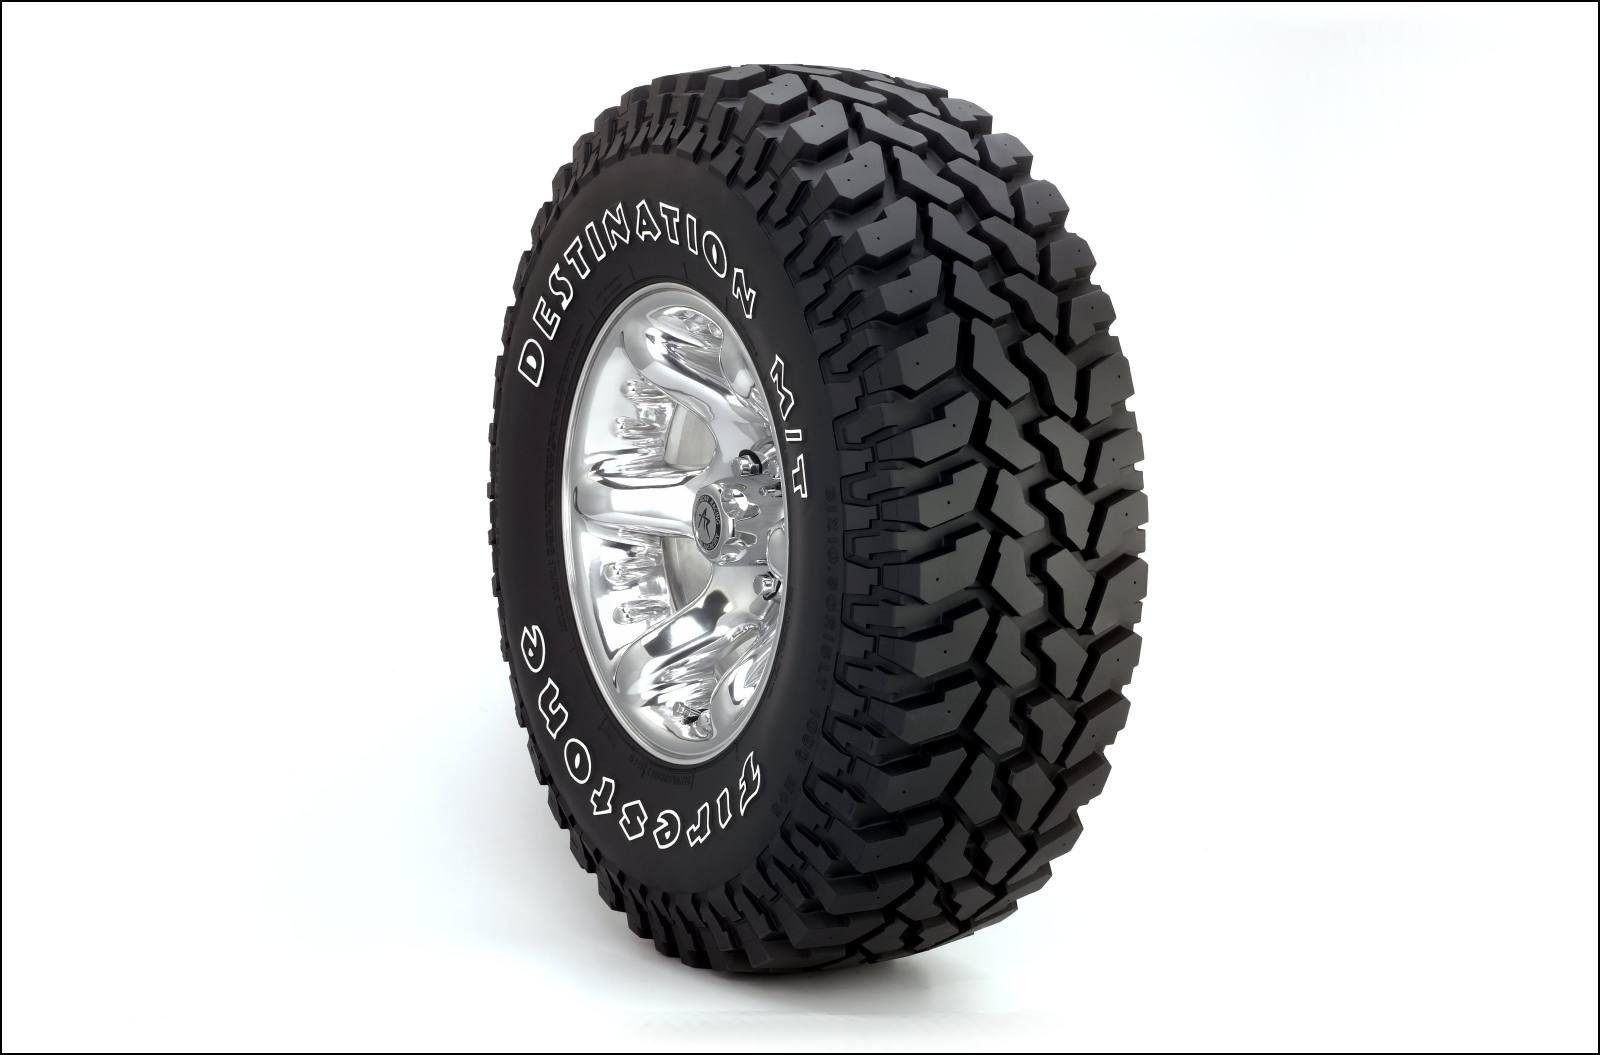 firestone tire package wheels tires gallery pinterest tired rh pinterest com